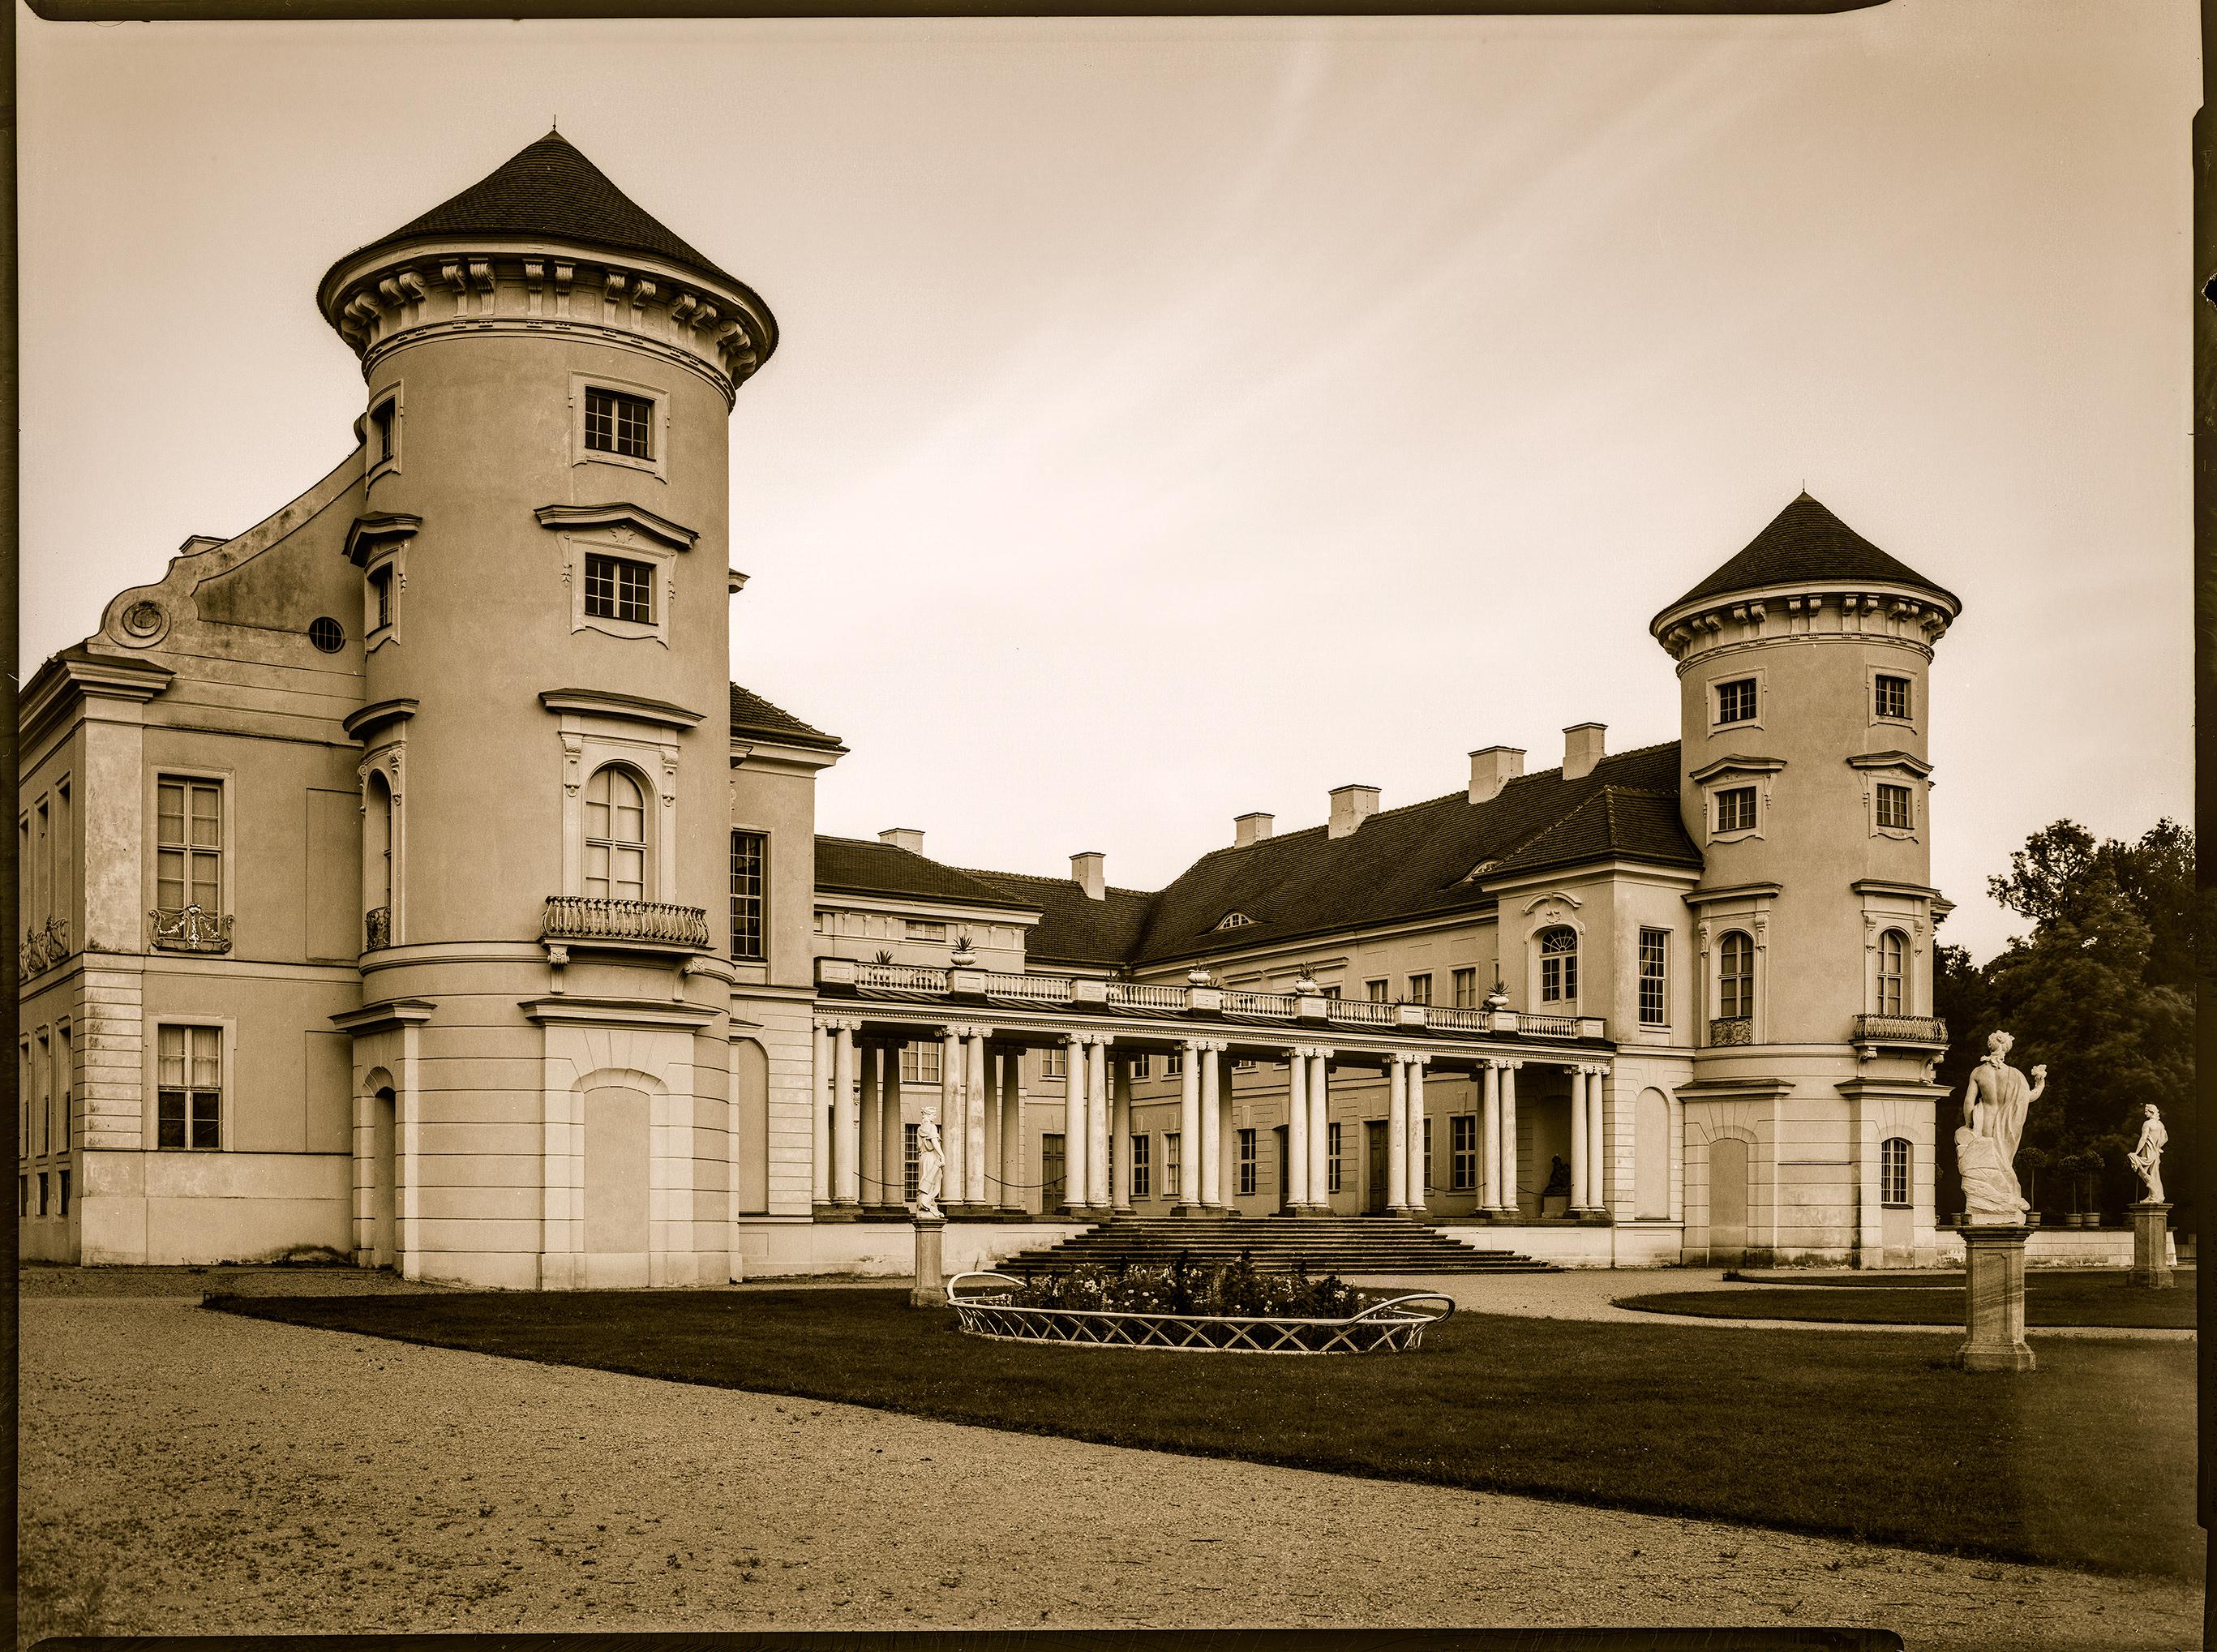 201906_GF912_Rheinsberg4-#309